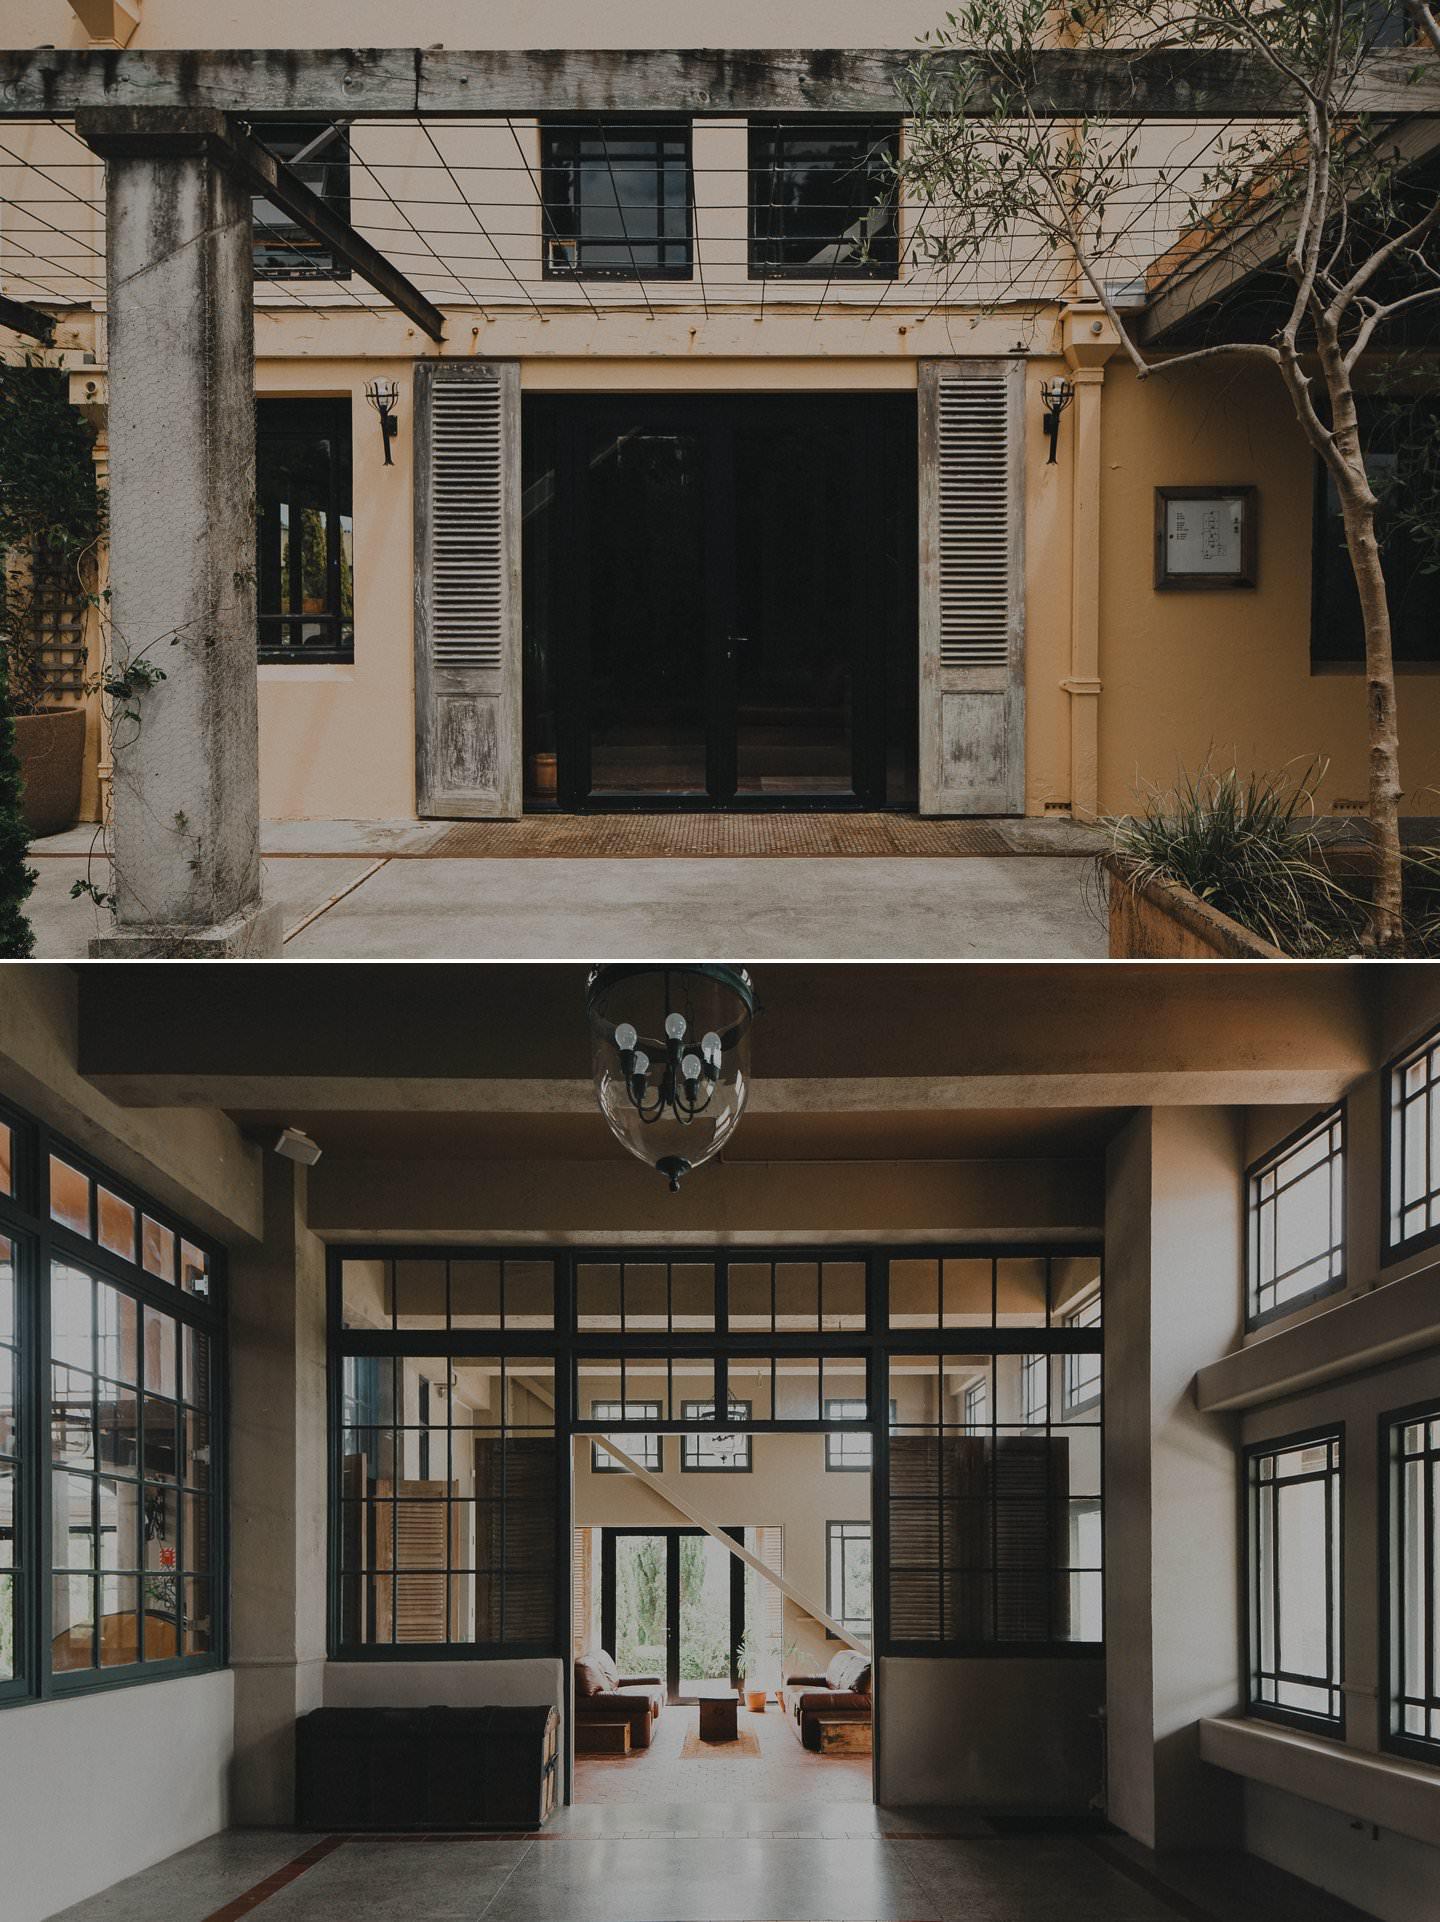 Otaki wedding venue and accommodation, the Milk Station